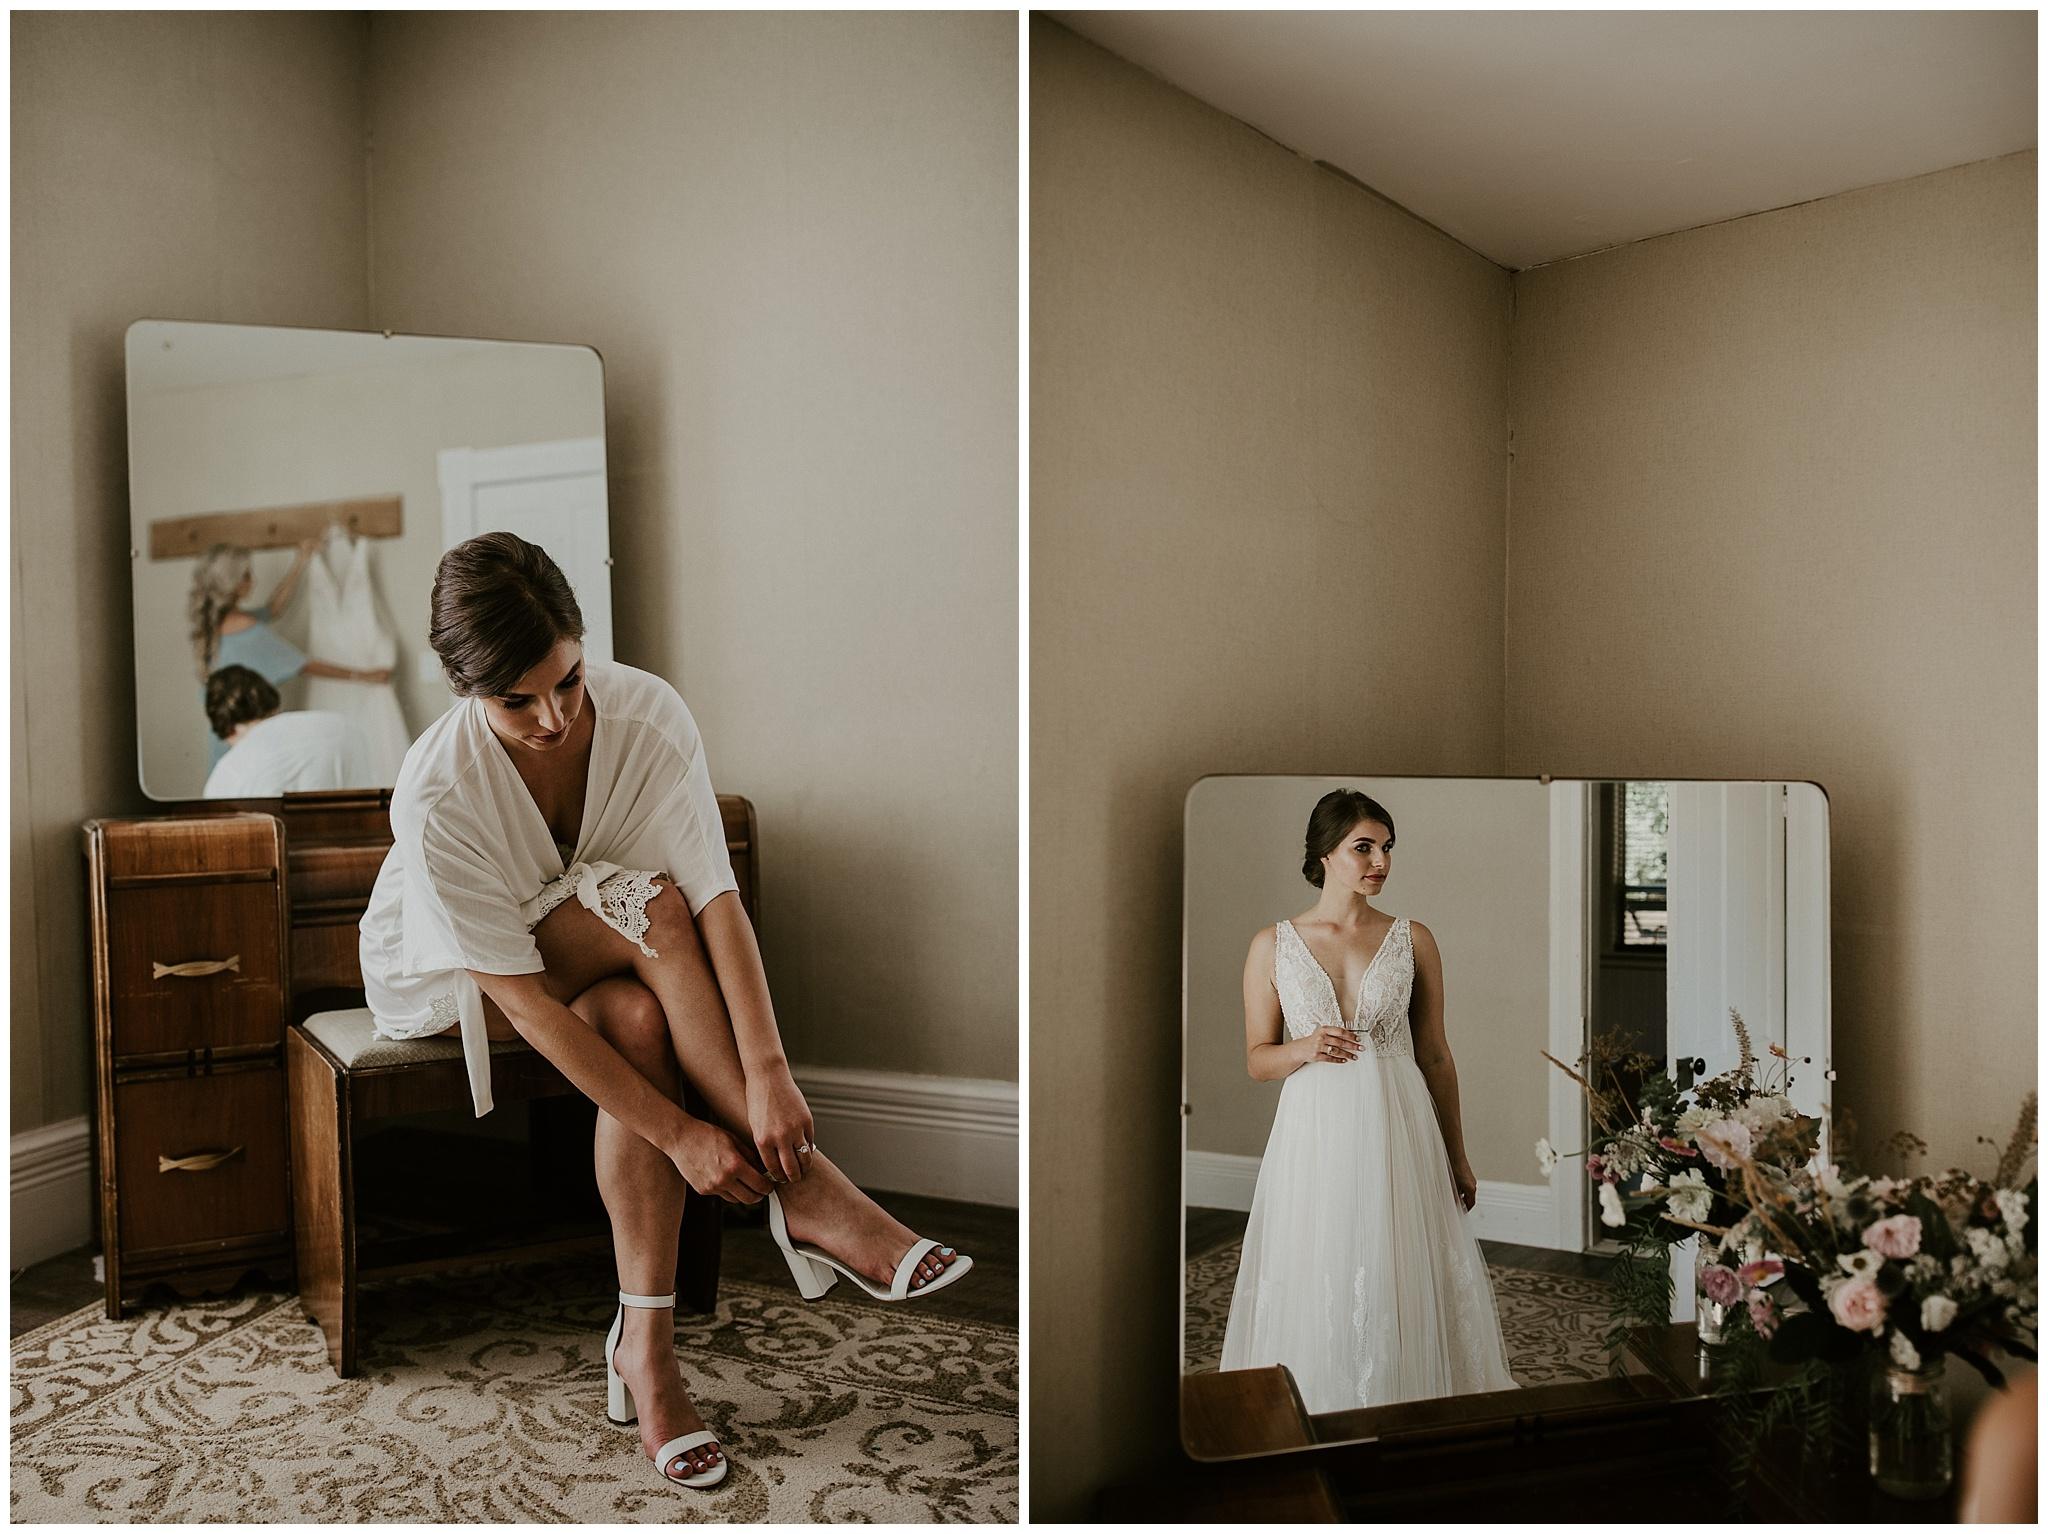 estate-248-wedding-langley-007.JPG